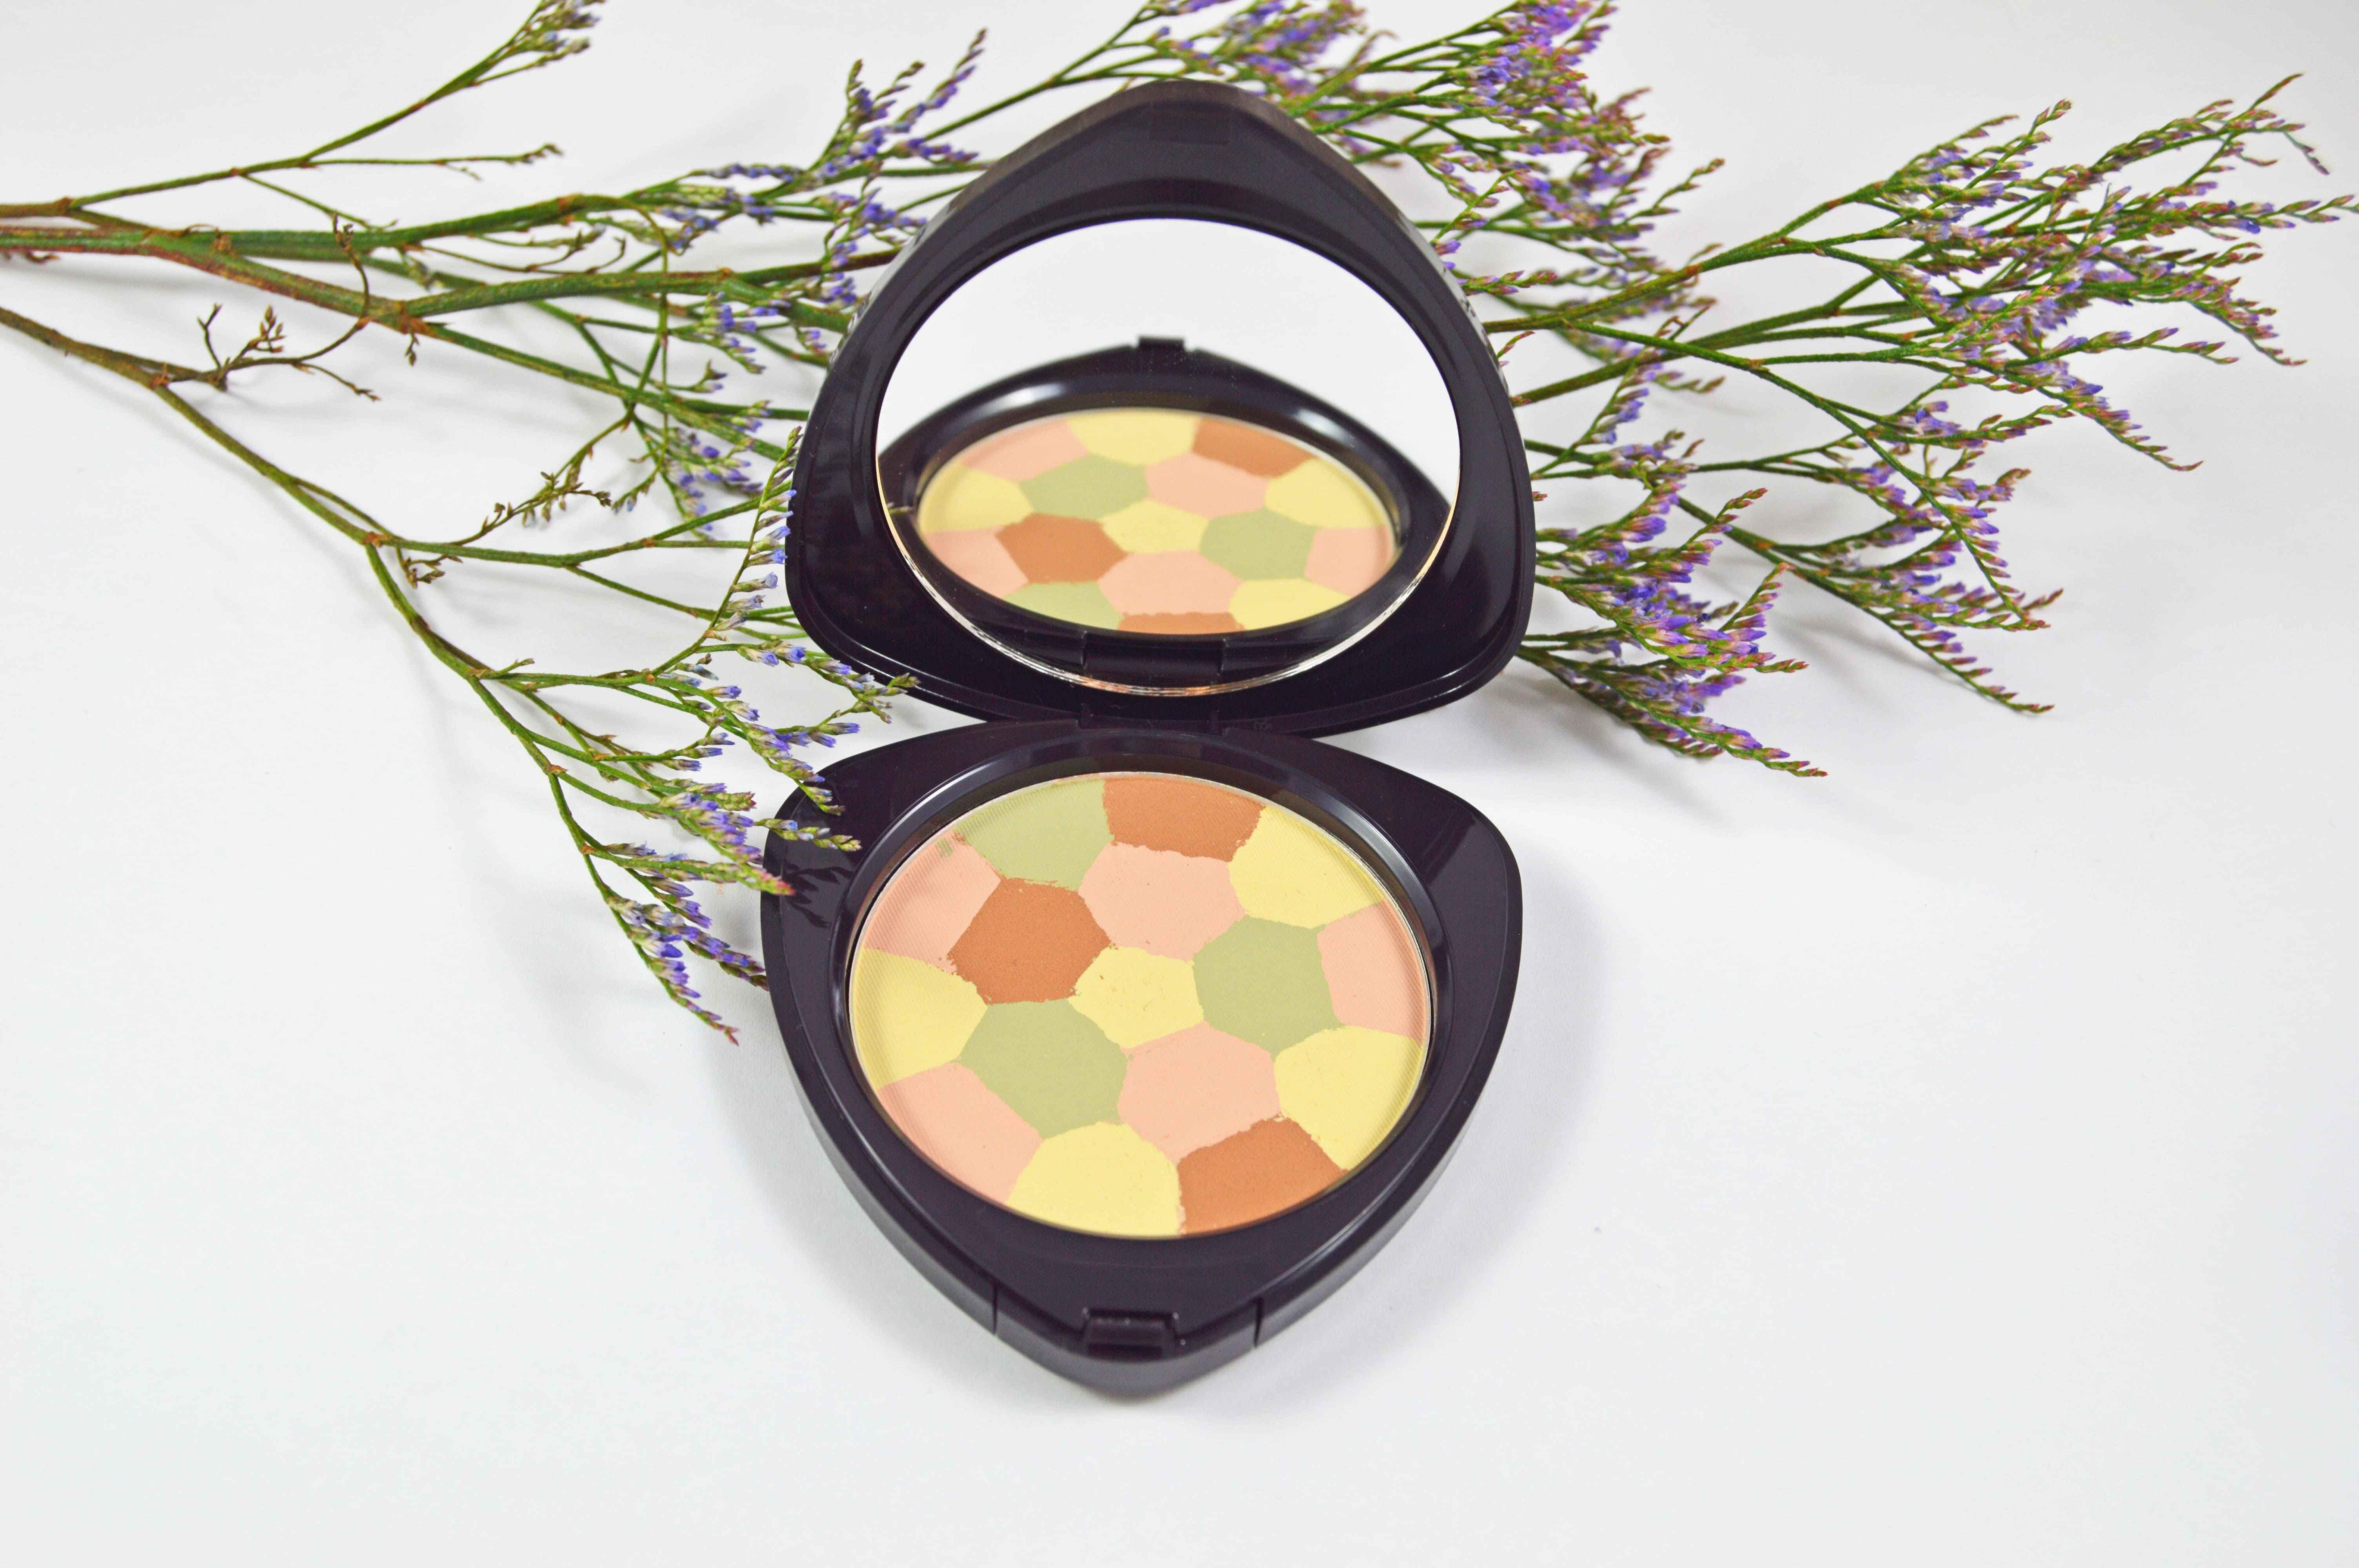 Dr. Hauschka - Colour Correcting Powder